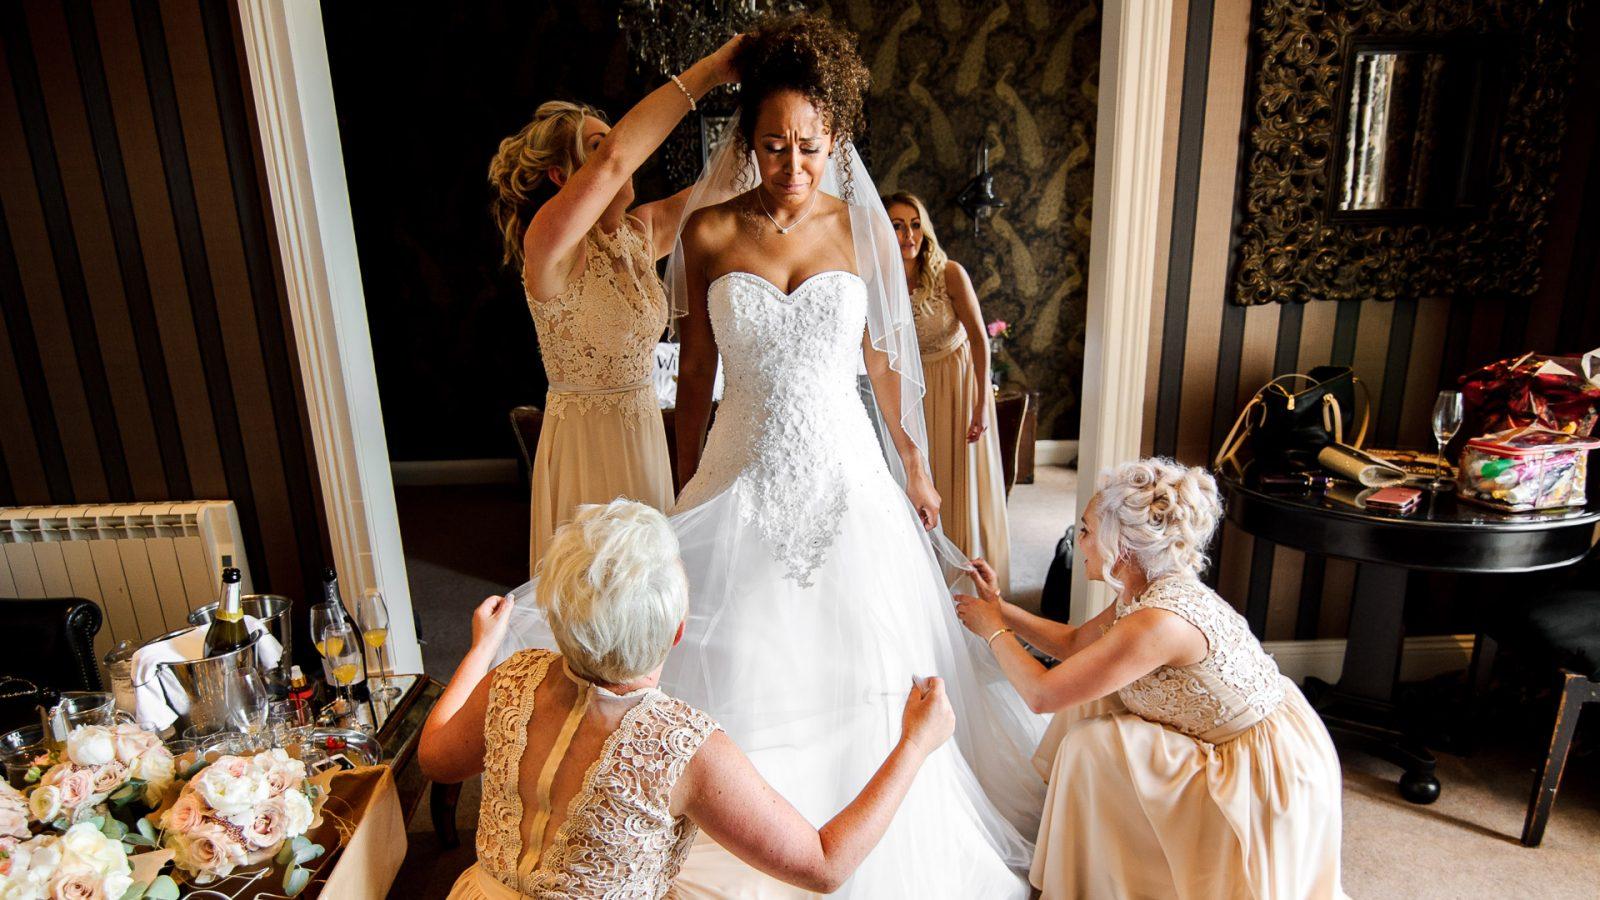 best-wedding-photos-2017-kimberley-and-joseph-bridesmaids-helping-bride-with-dress